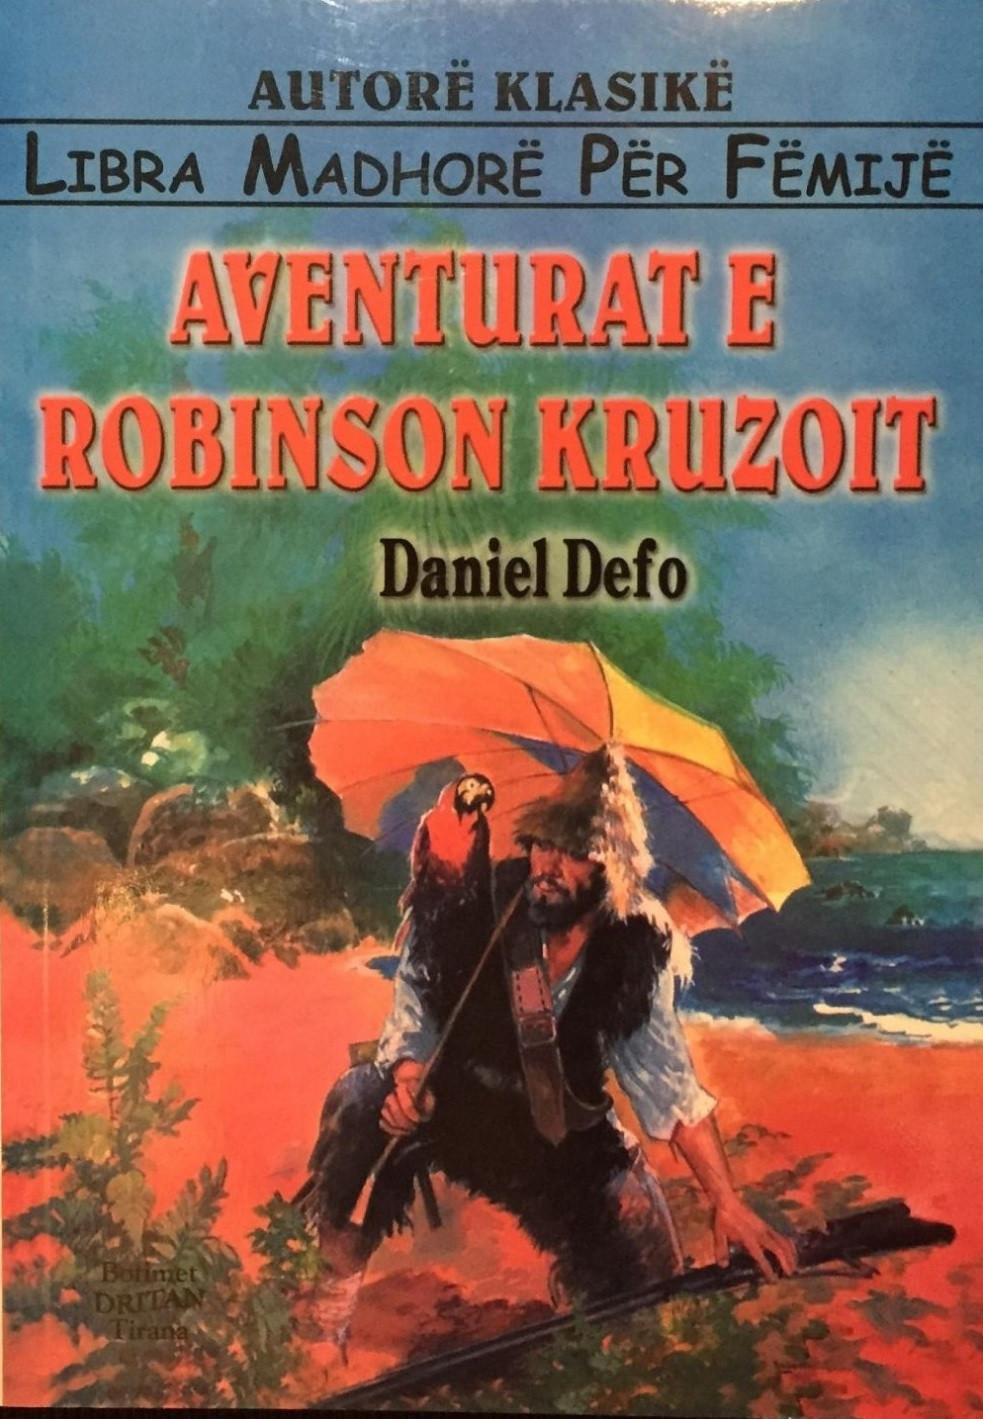 Aventurat e Robinson Kruzoit – Dritan